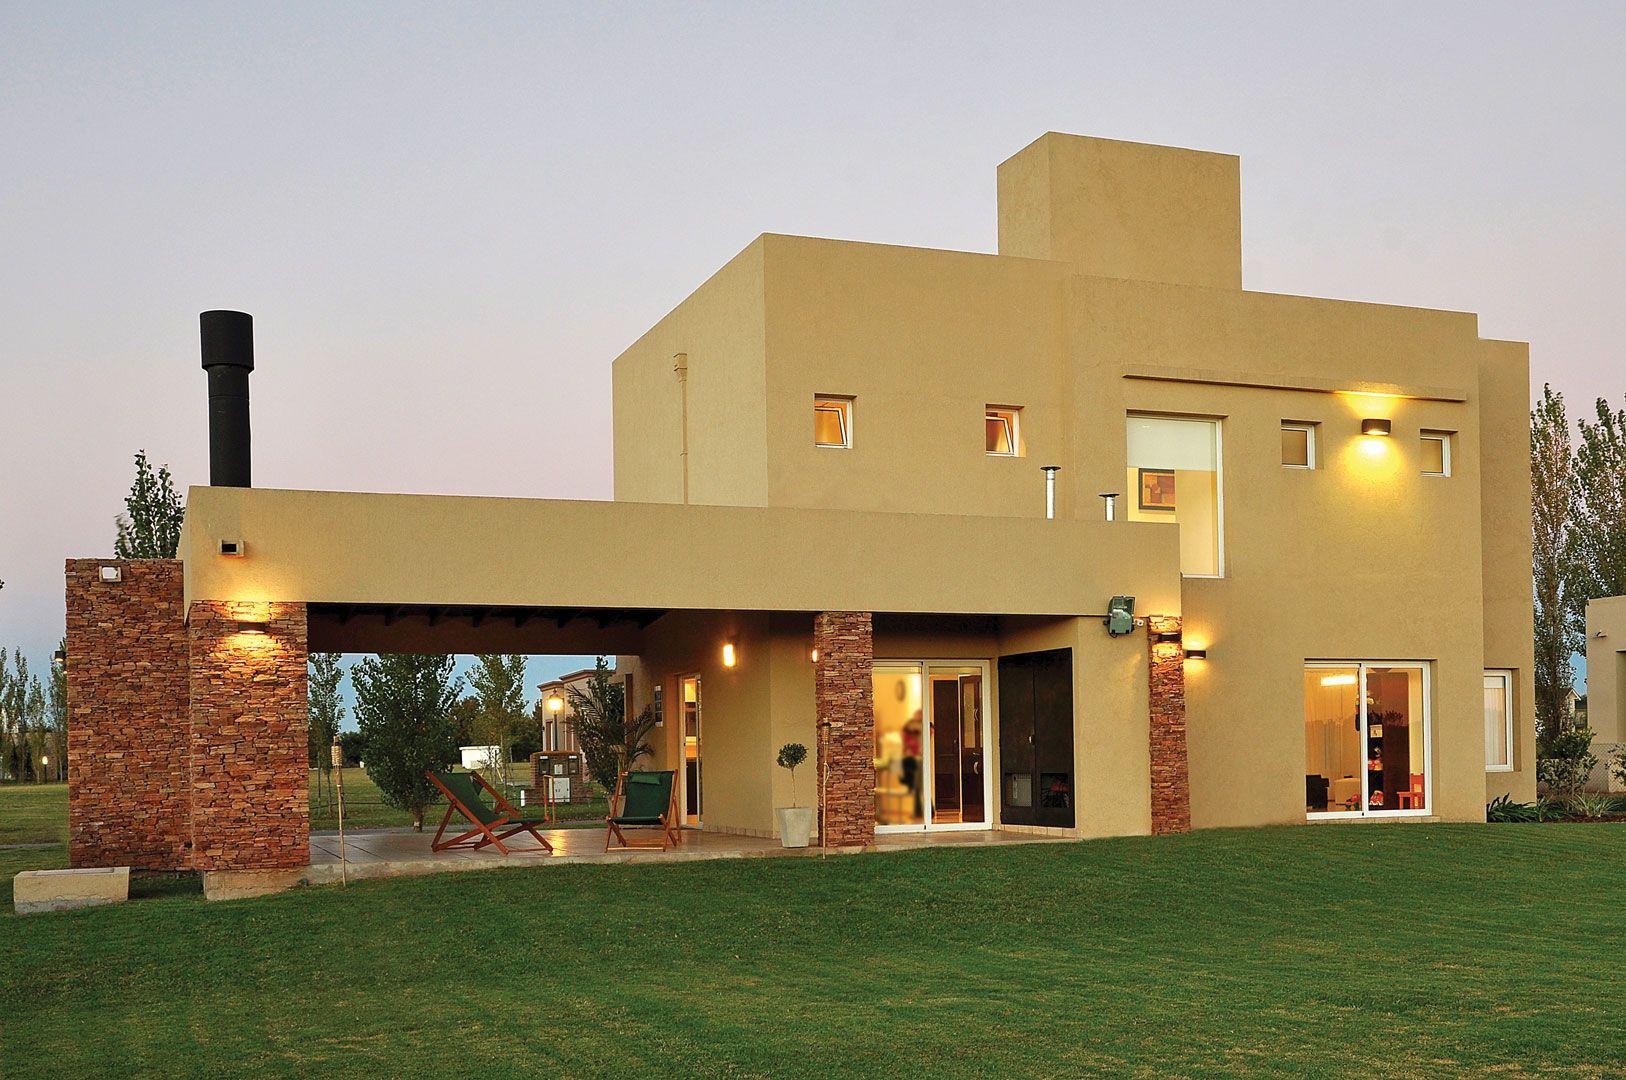 Seratti y saviotti arquitectos fachadas house home for Casa home goods